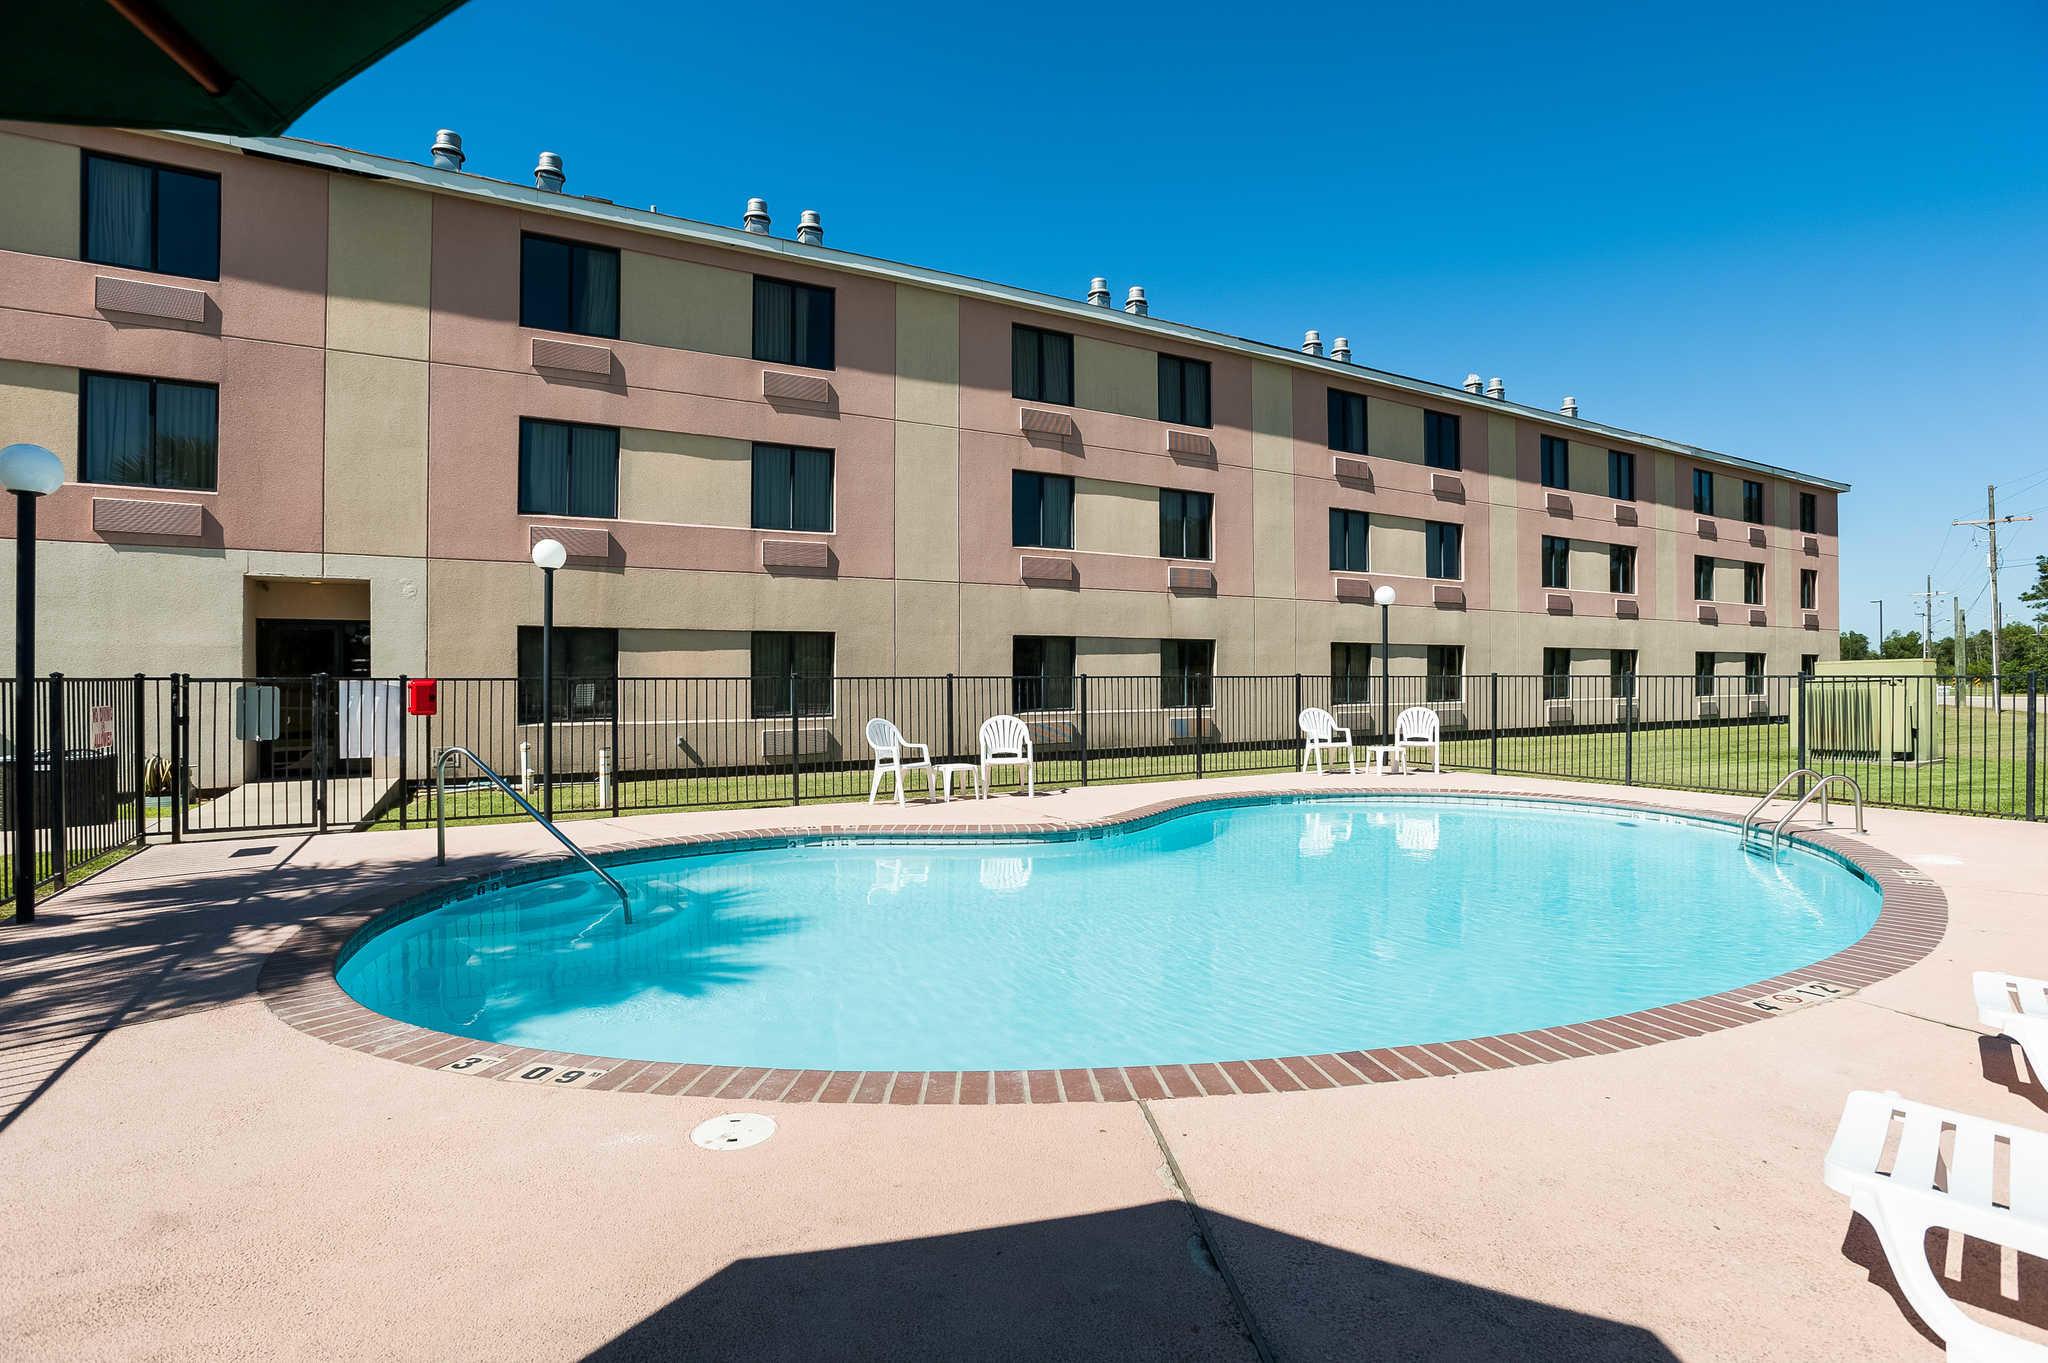 Quality Inn & Suites image 47